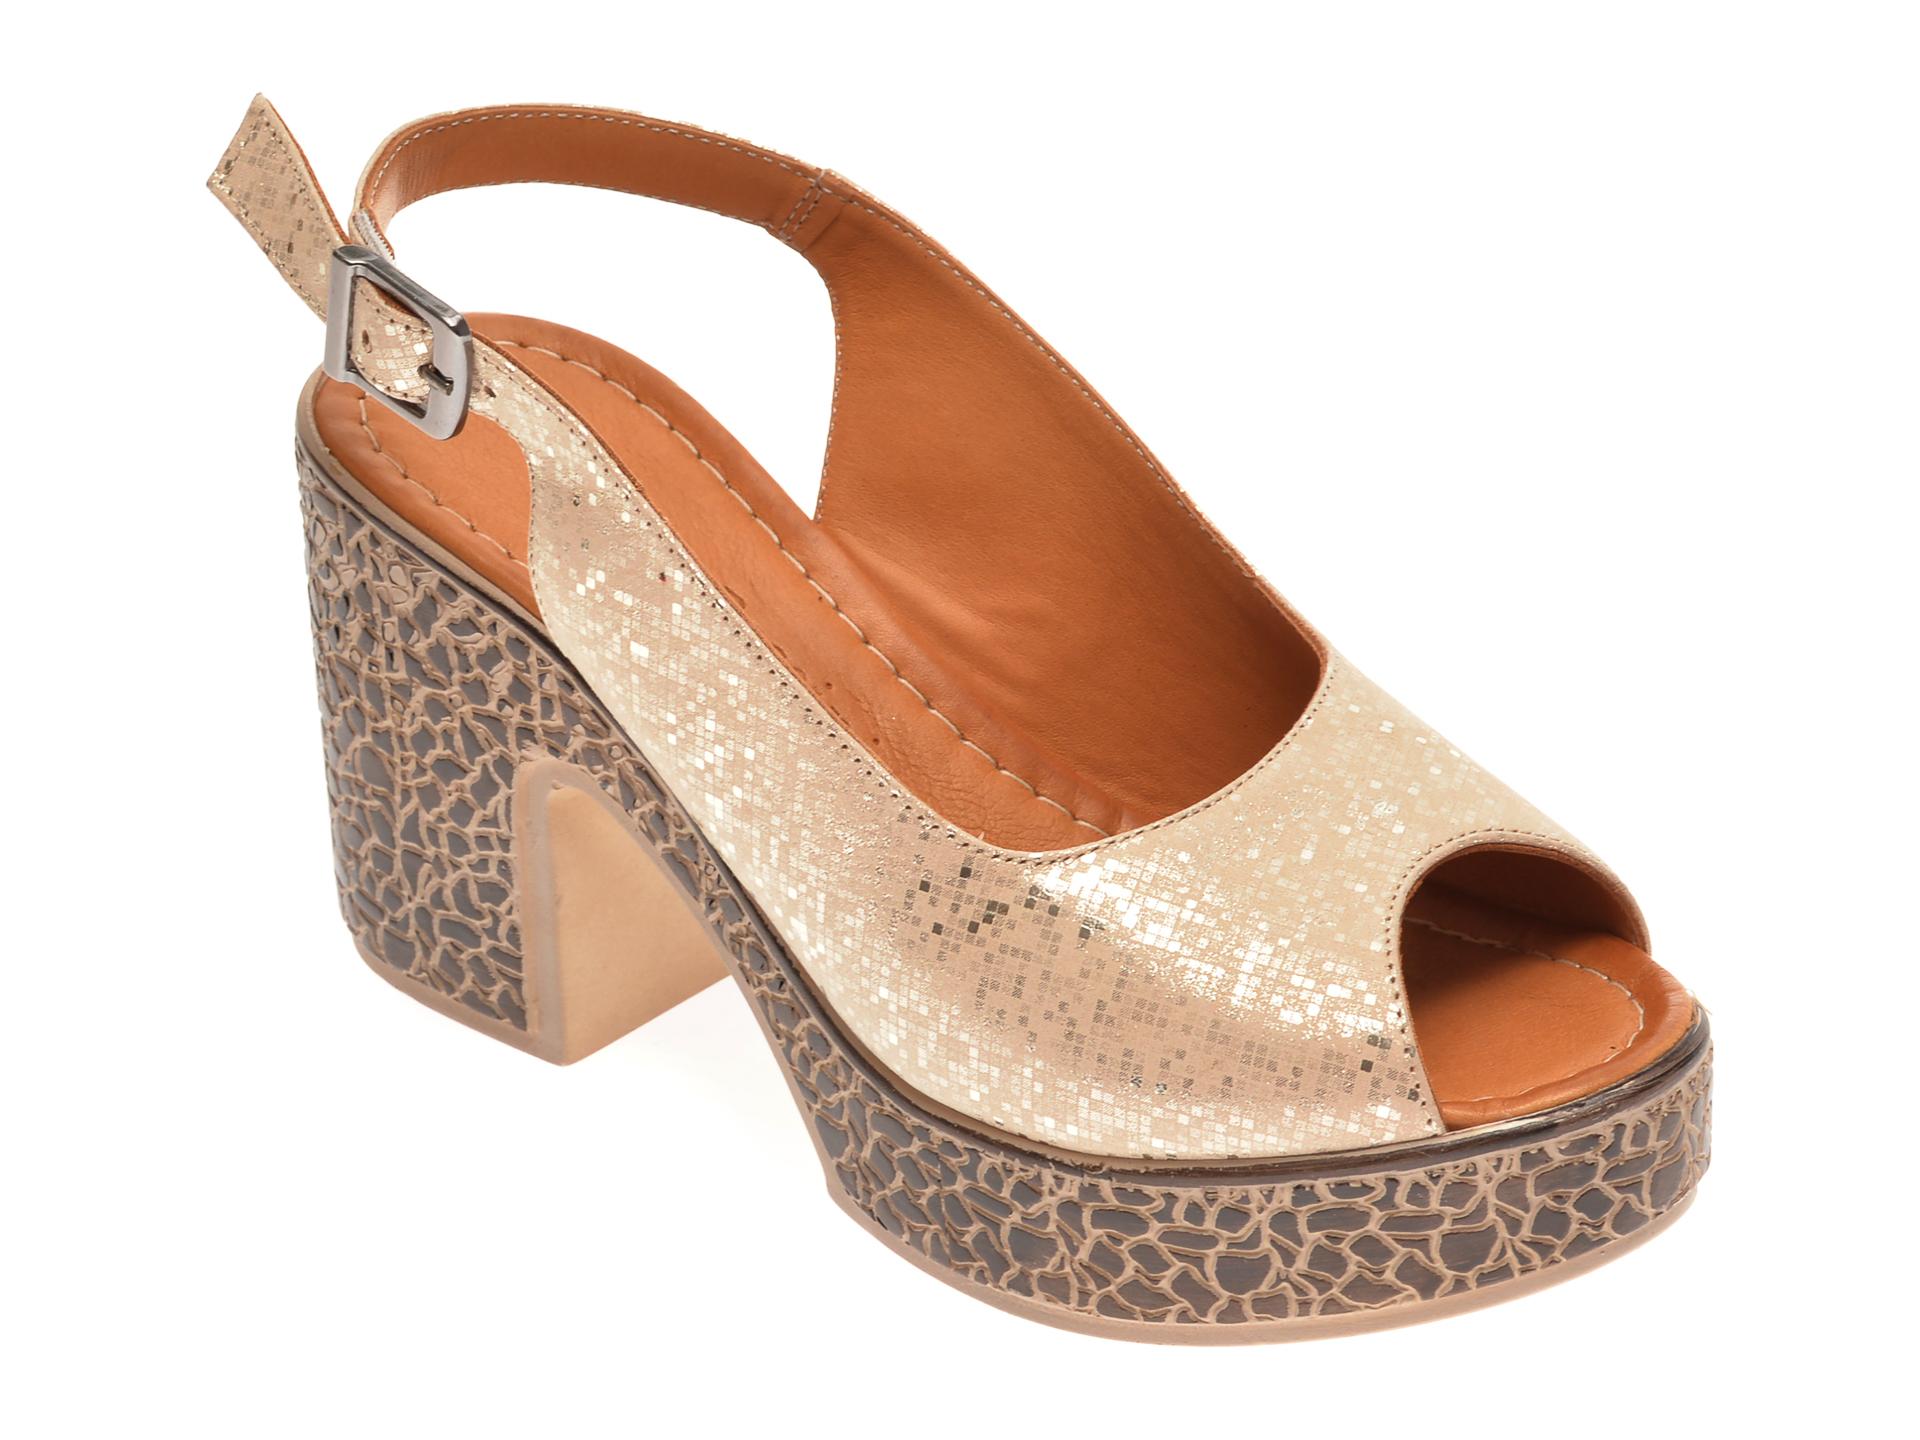 Sandale FLAVIA PASSINI bej, 1181735, din piele naturala New